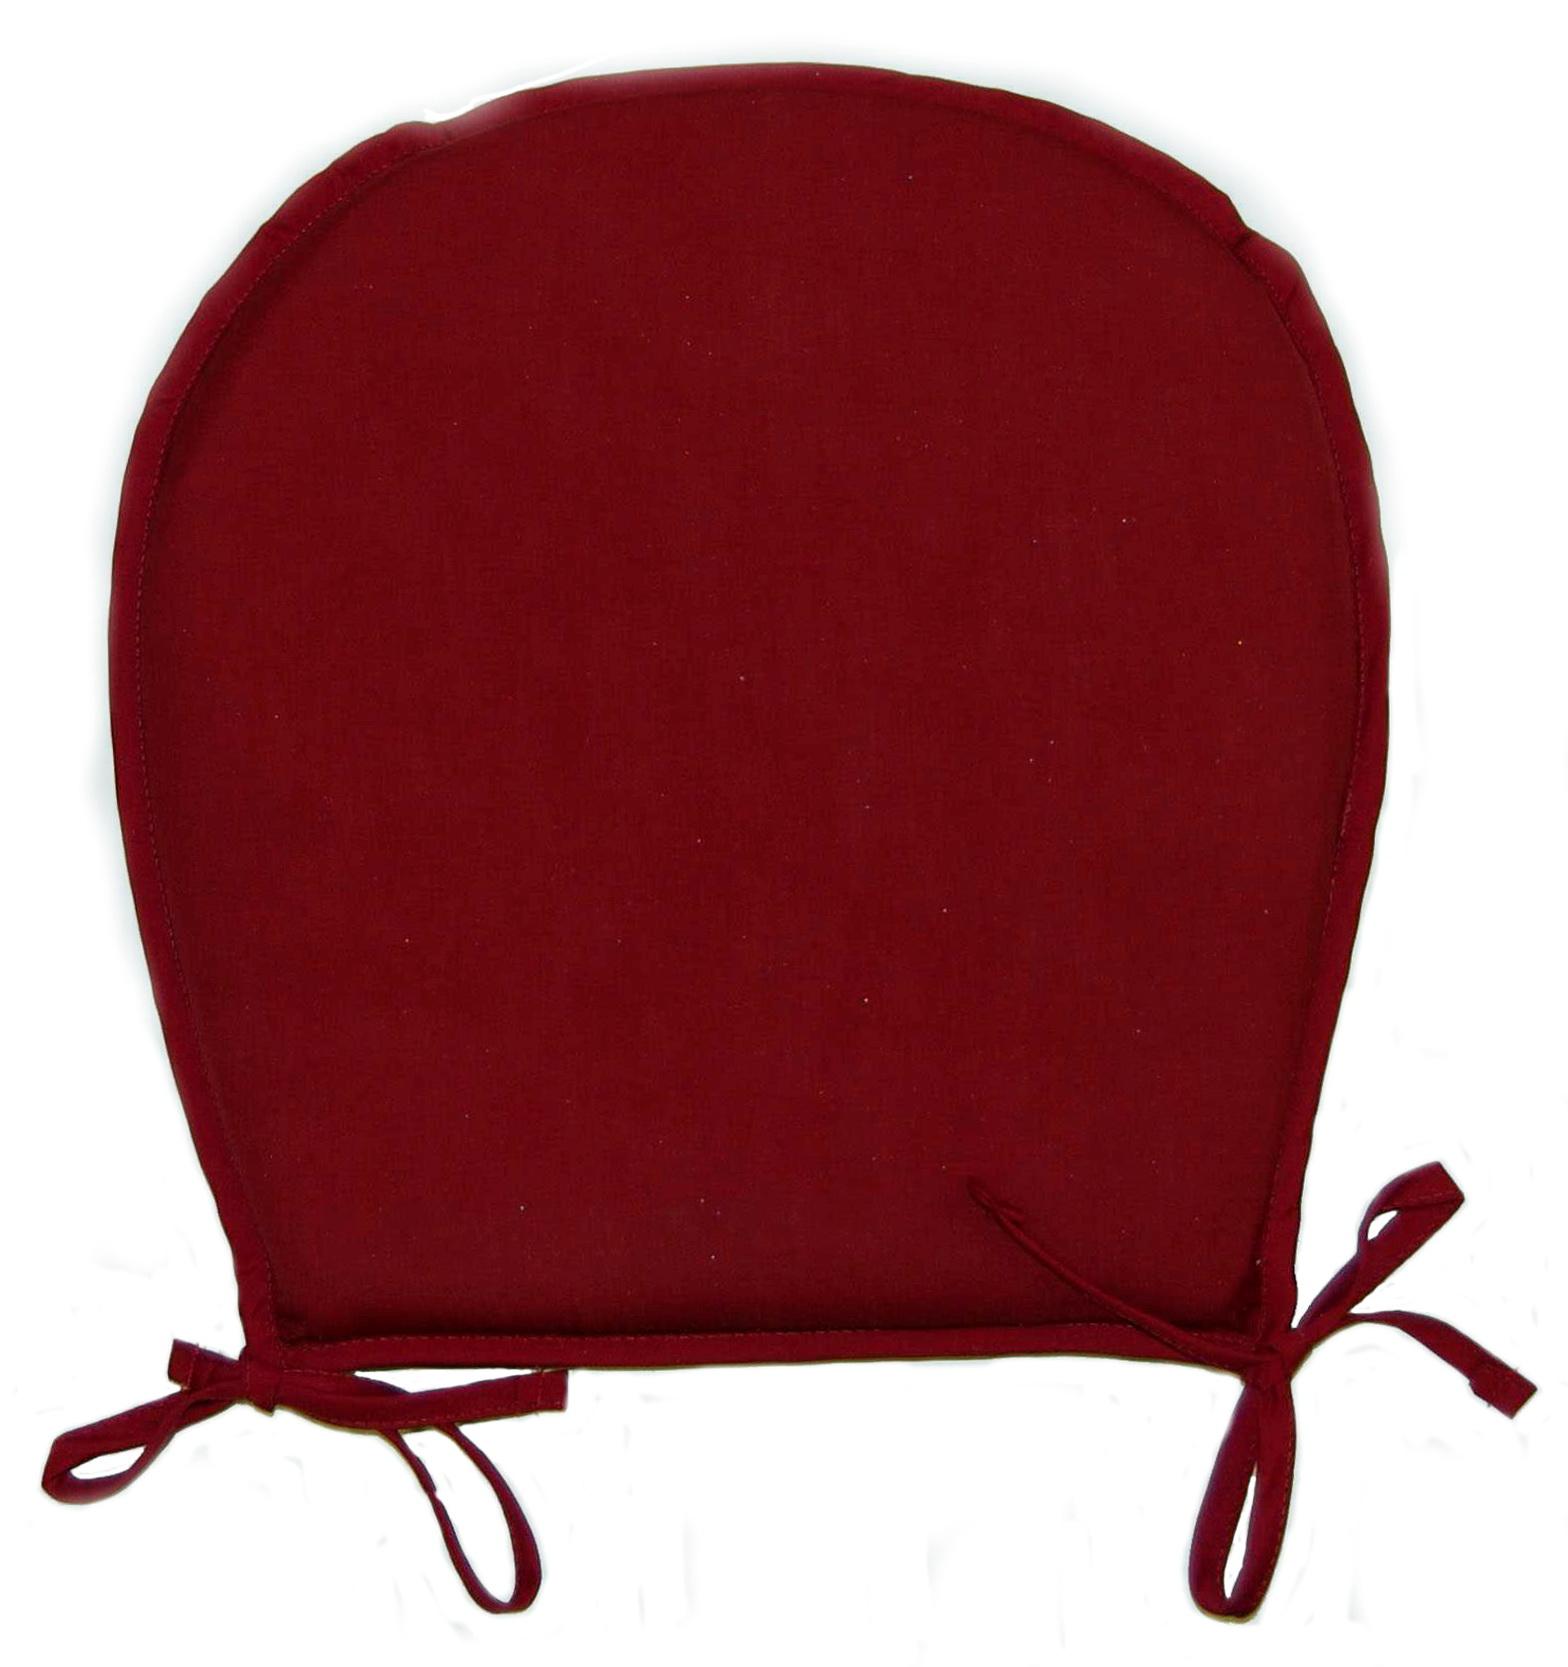 Kitchen Seat Cushions Ikea